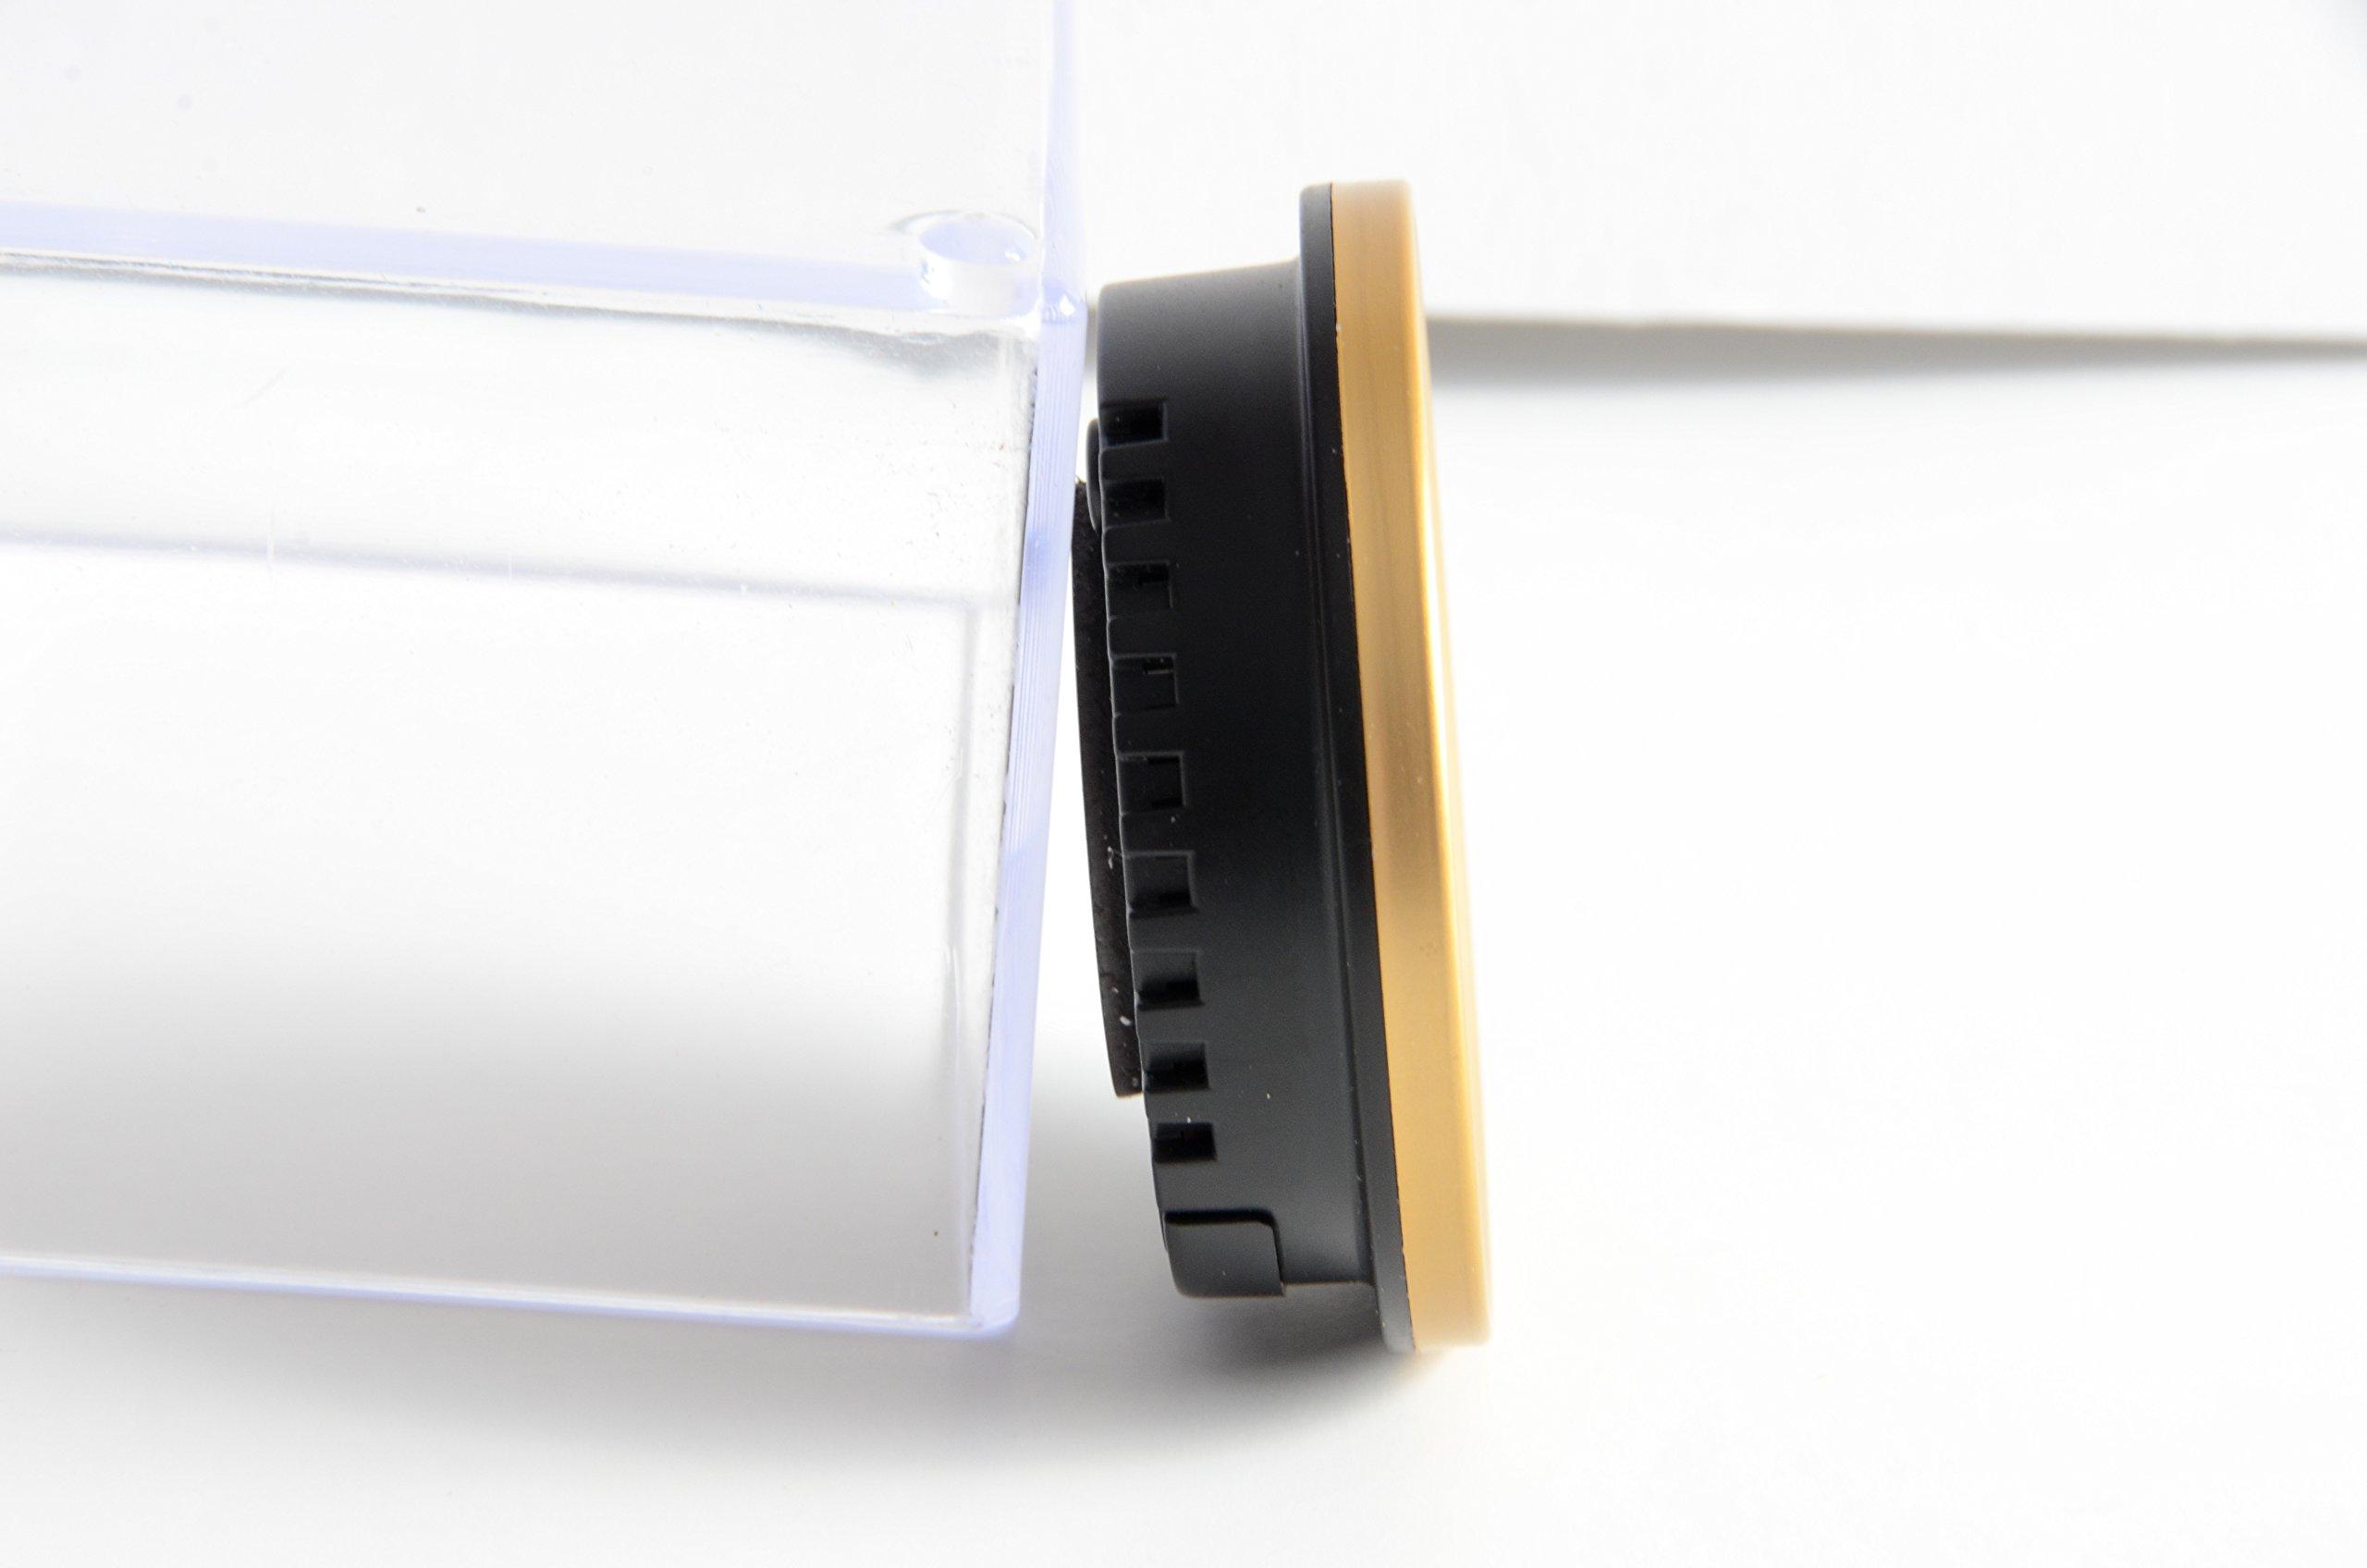 Cigar Oasis Caliber 4R Gold Digital/Analog Hygrometer by Western Humidor by Cigar Oasis